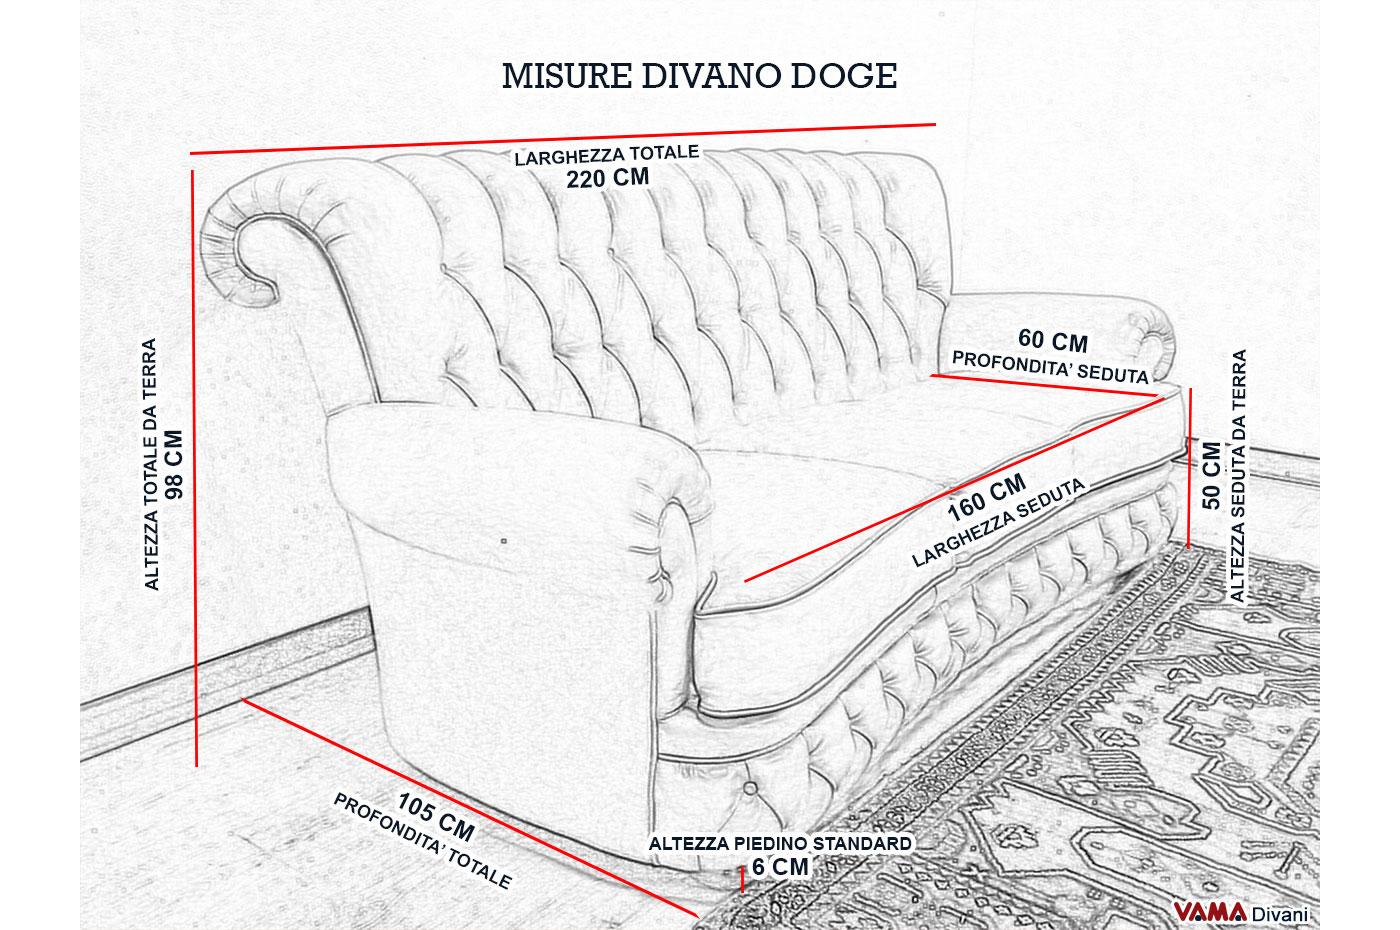 https://www.vamadivani.it/wp-content/uploads/2014/11/Misure-Divano-Doge.jpg